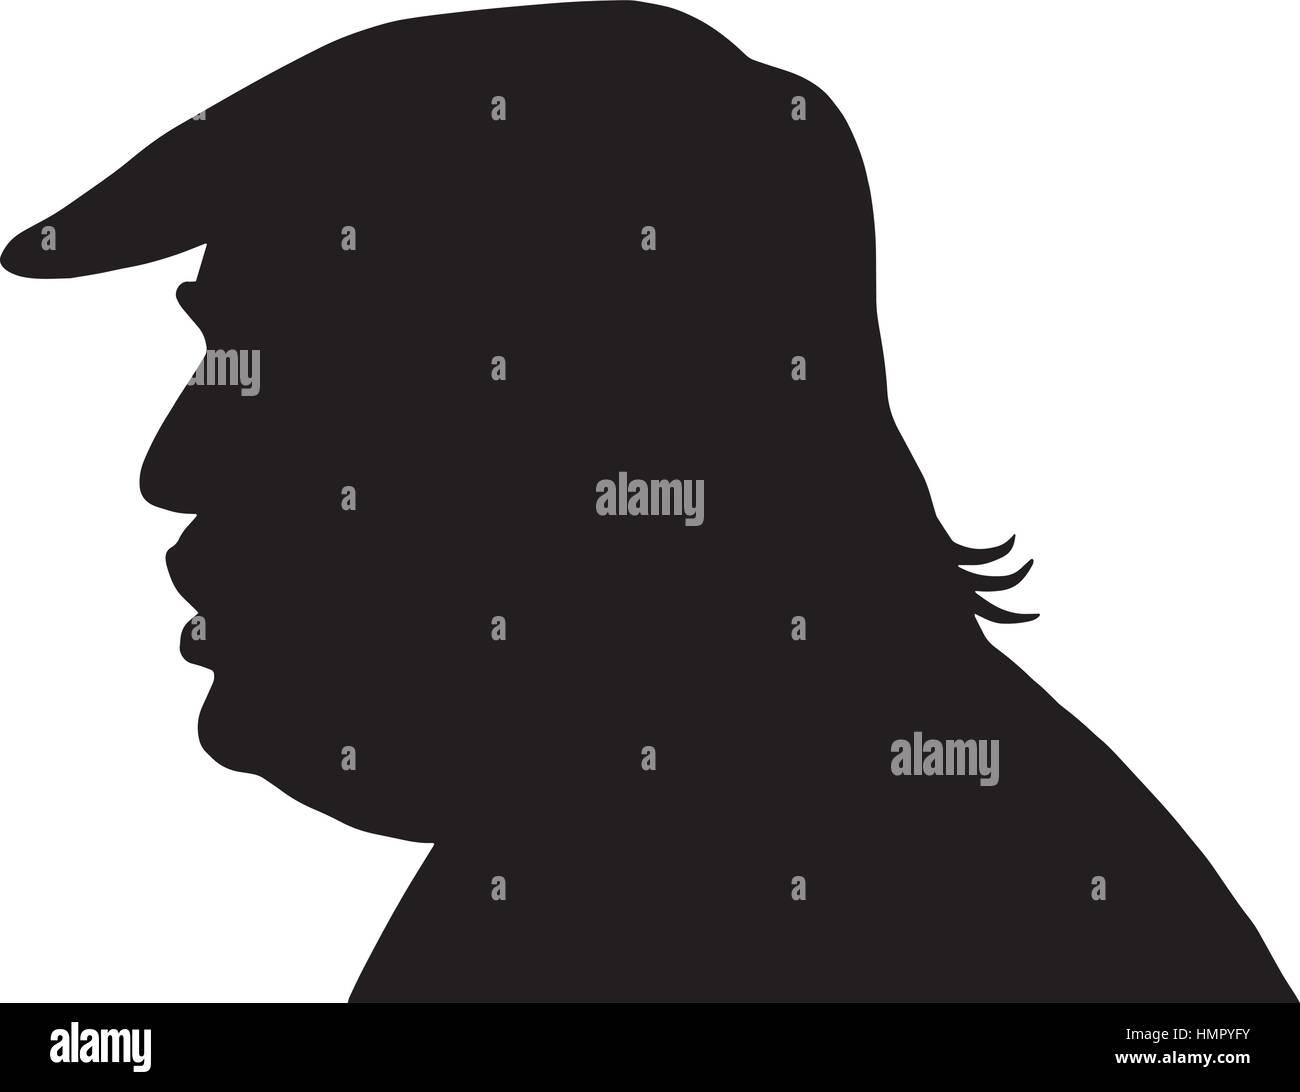 Donald Trump Silhouette Vector - Stock Image